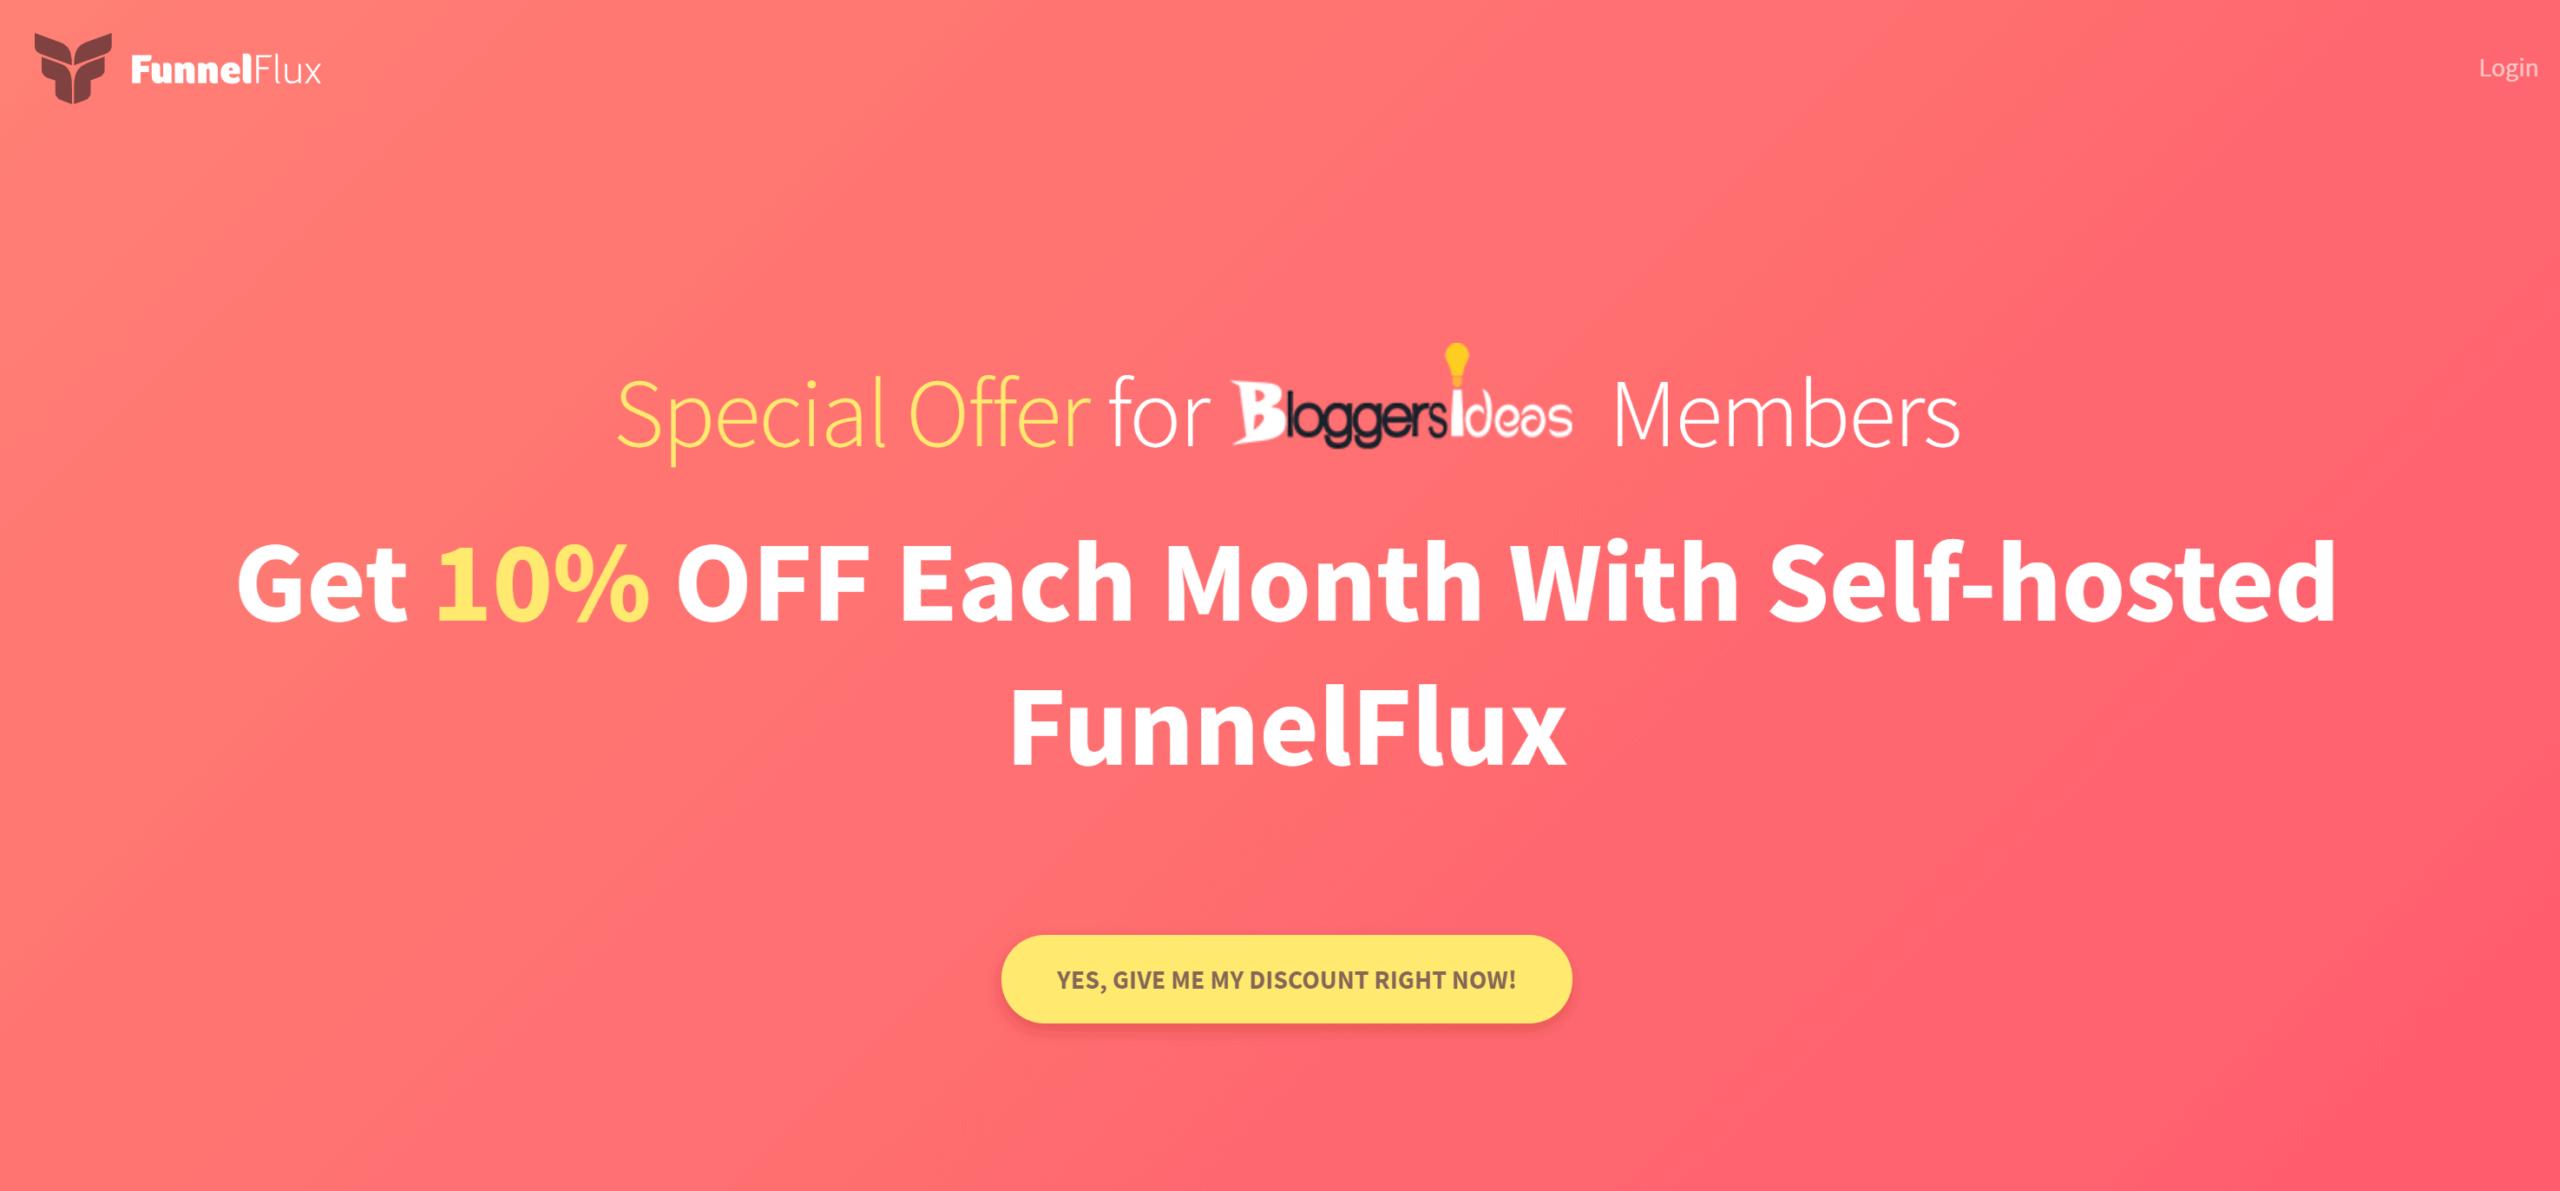 FunnelFlux Reviews